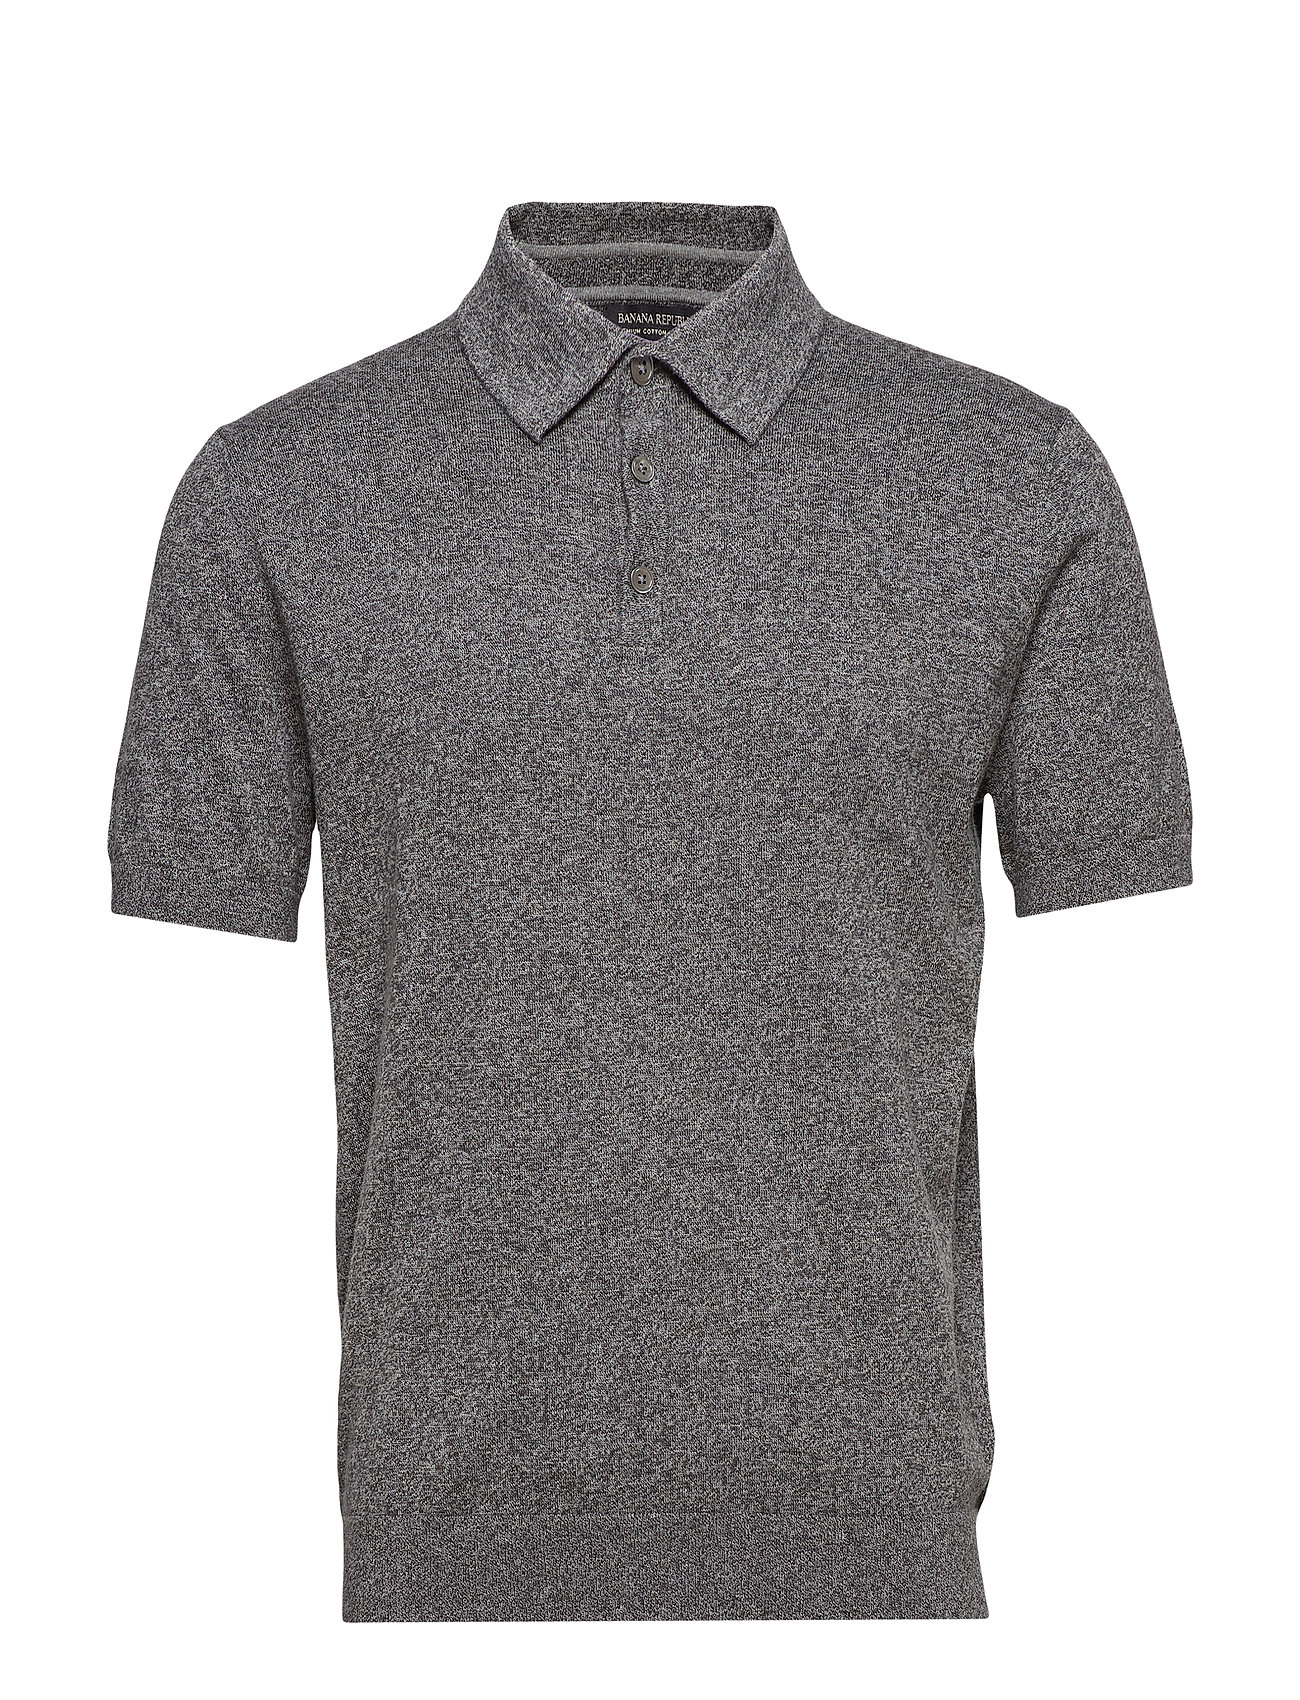 GreyBanana Ss Contrast Republic Pcc Collar Polodark xorBedCWQE